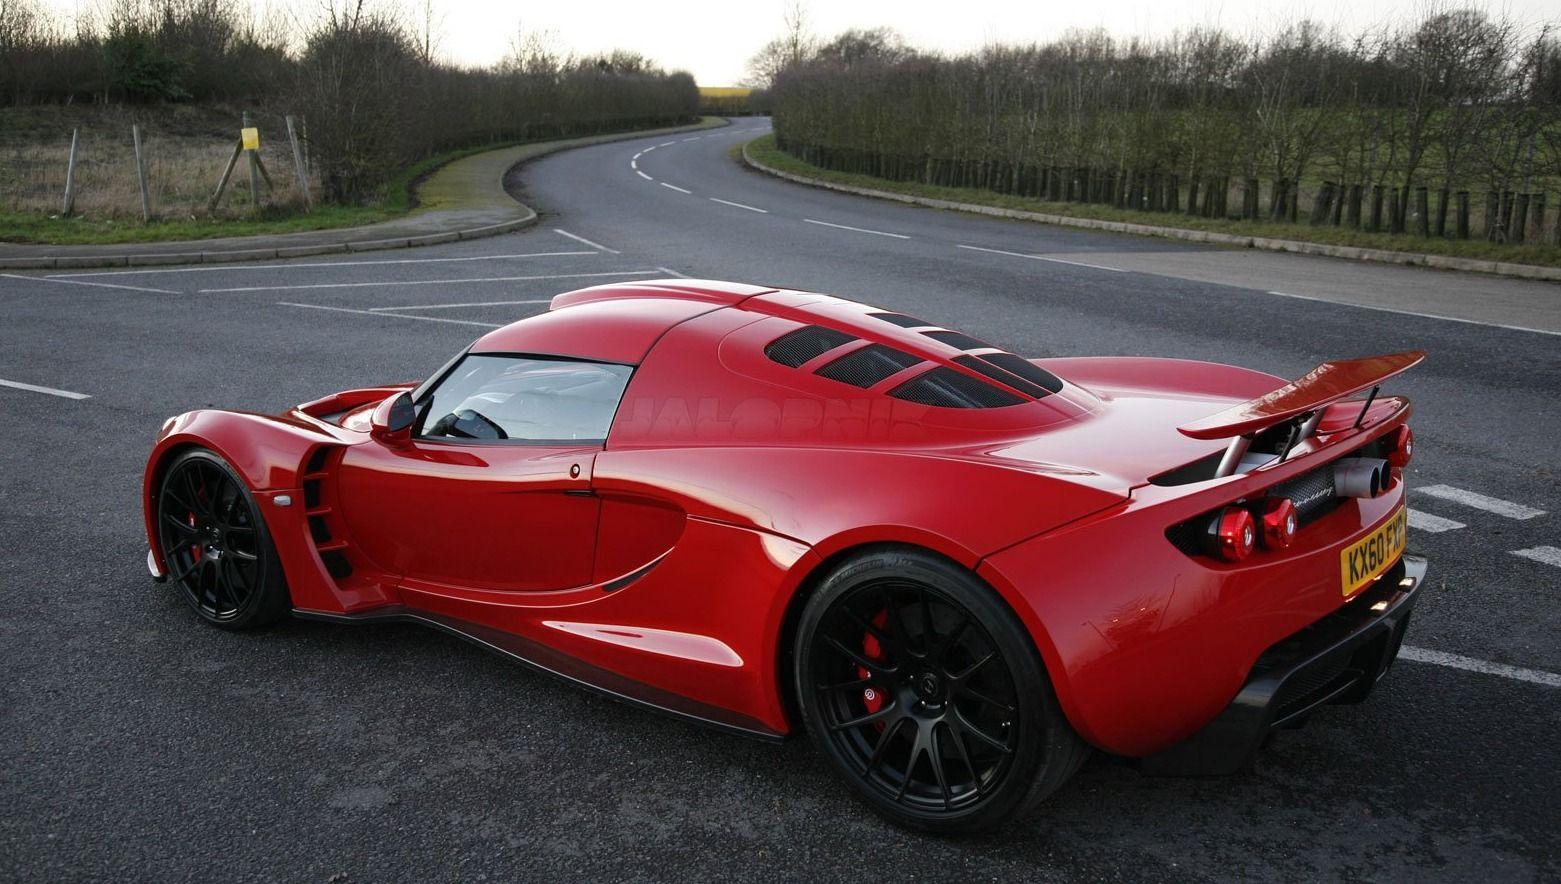 Hennessey Venom Gt Hennessey Venom Gt Super Cars Hennessey 2014 venom gt world speed record by